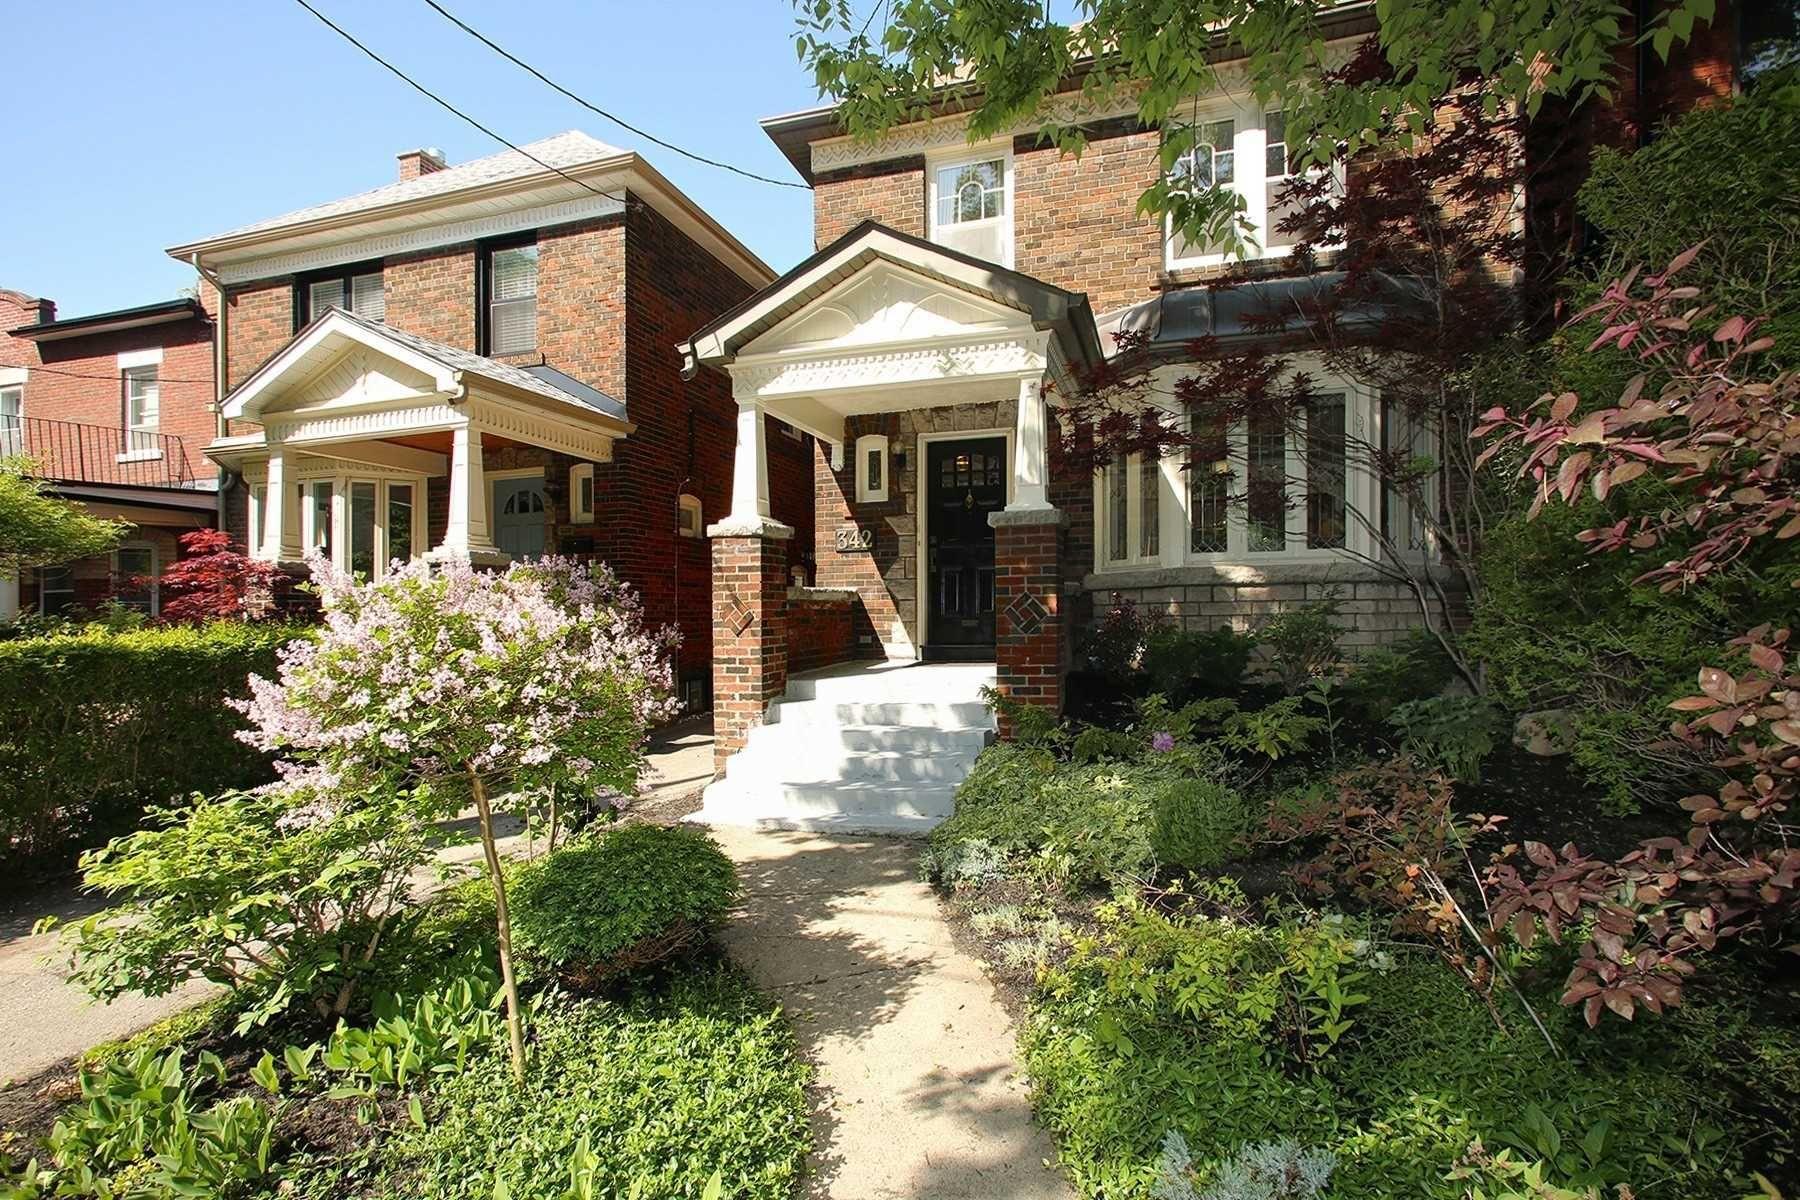 Main Photo: 342 Markham Street in Toronto: Palmerston-Little Italy House (2-Storey) for sale (Toronto C01)  : MLS®# C5265162